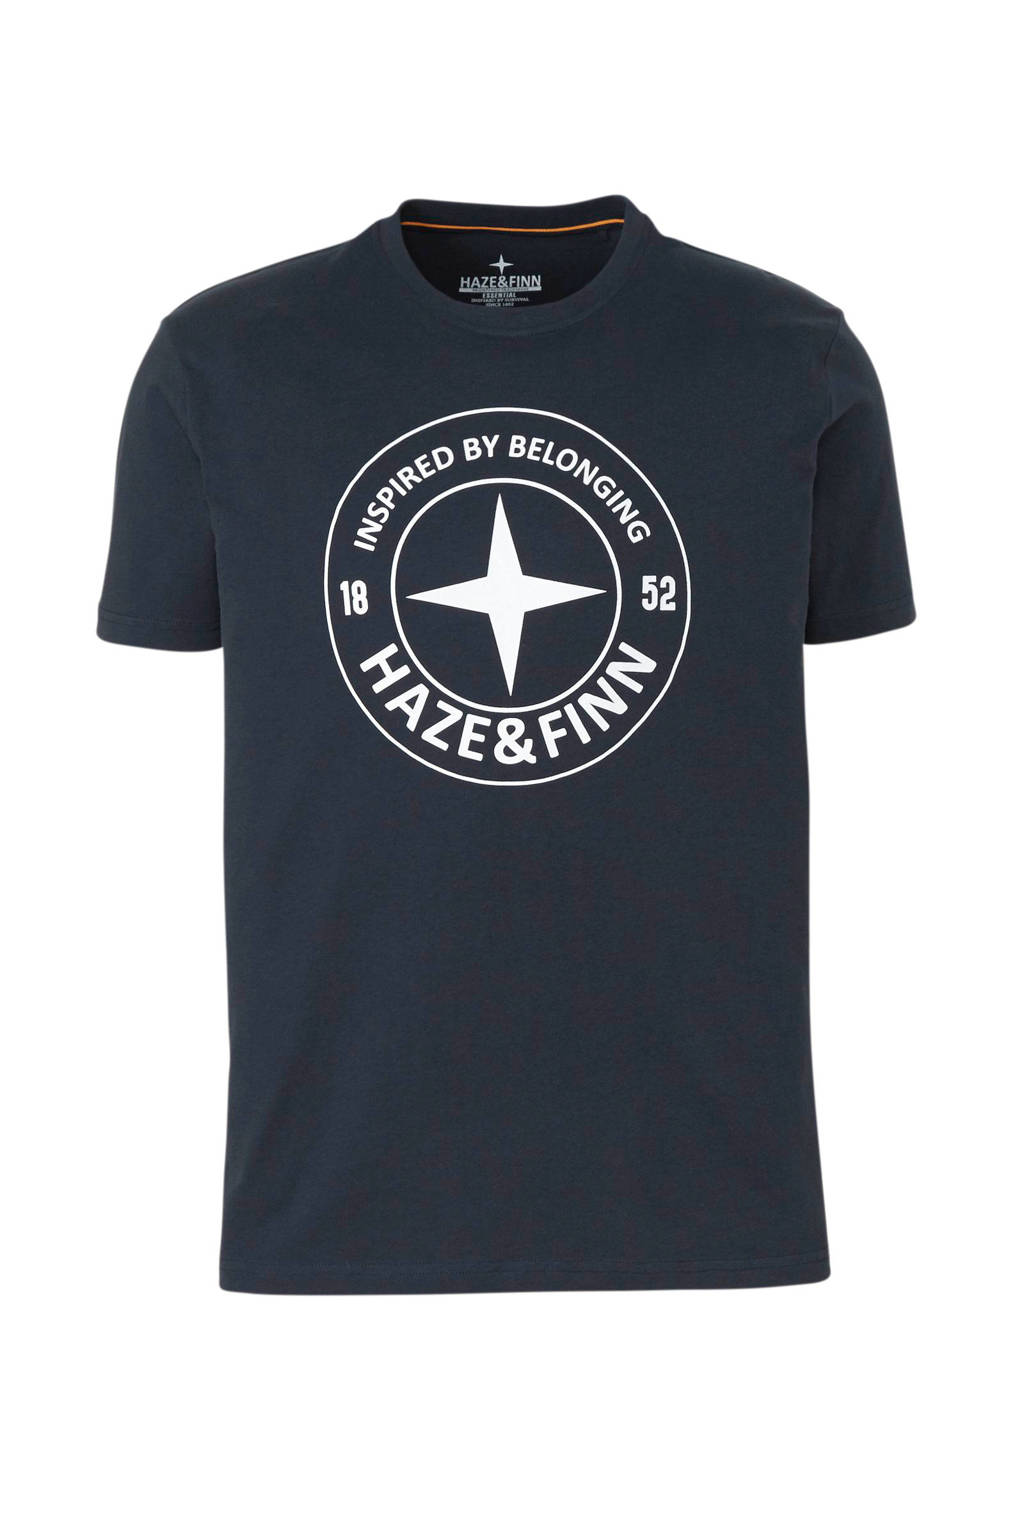 Haze & Finn T-shirt met printopdruk marine, Marine